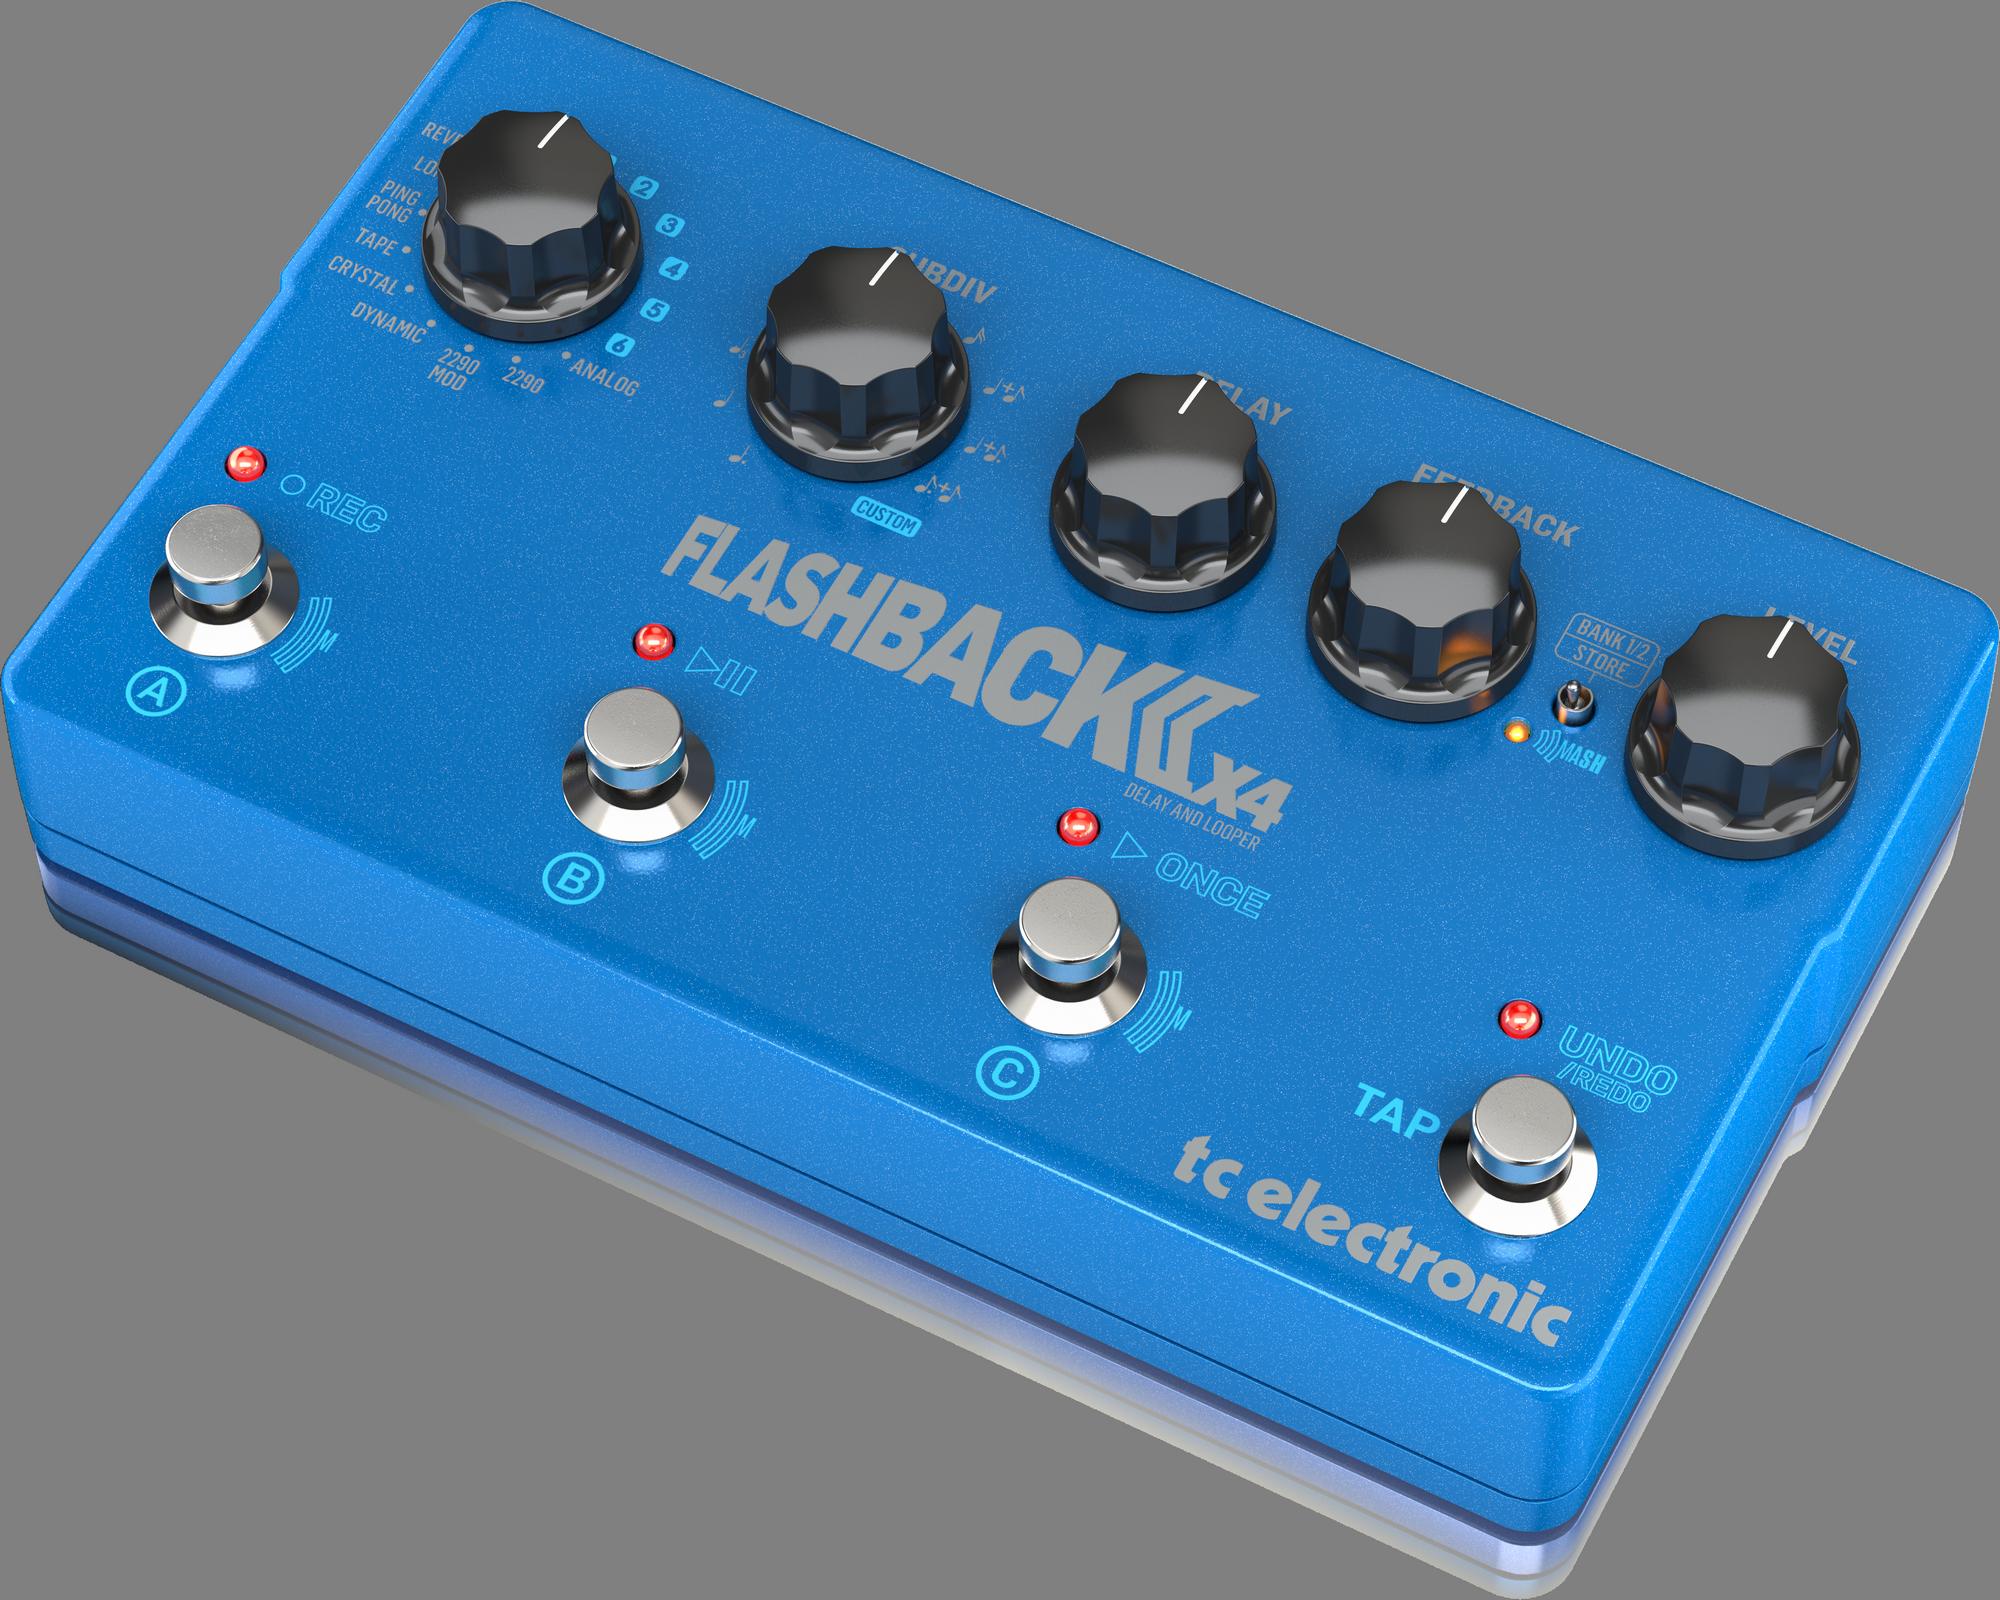 TC-Electronic FLASHBACK 2 X4 DELAY - Guitar effect